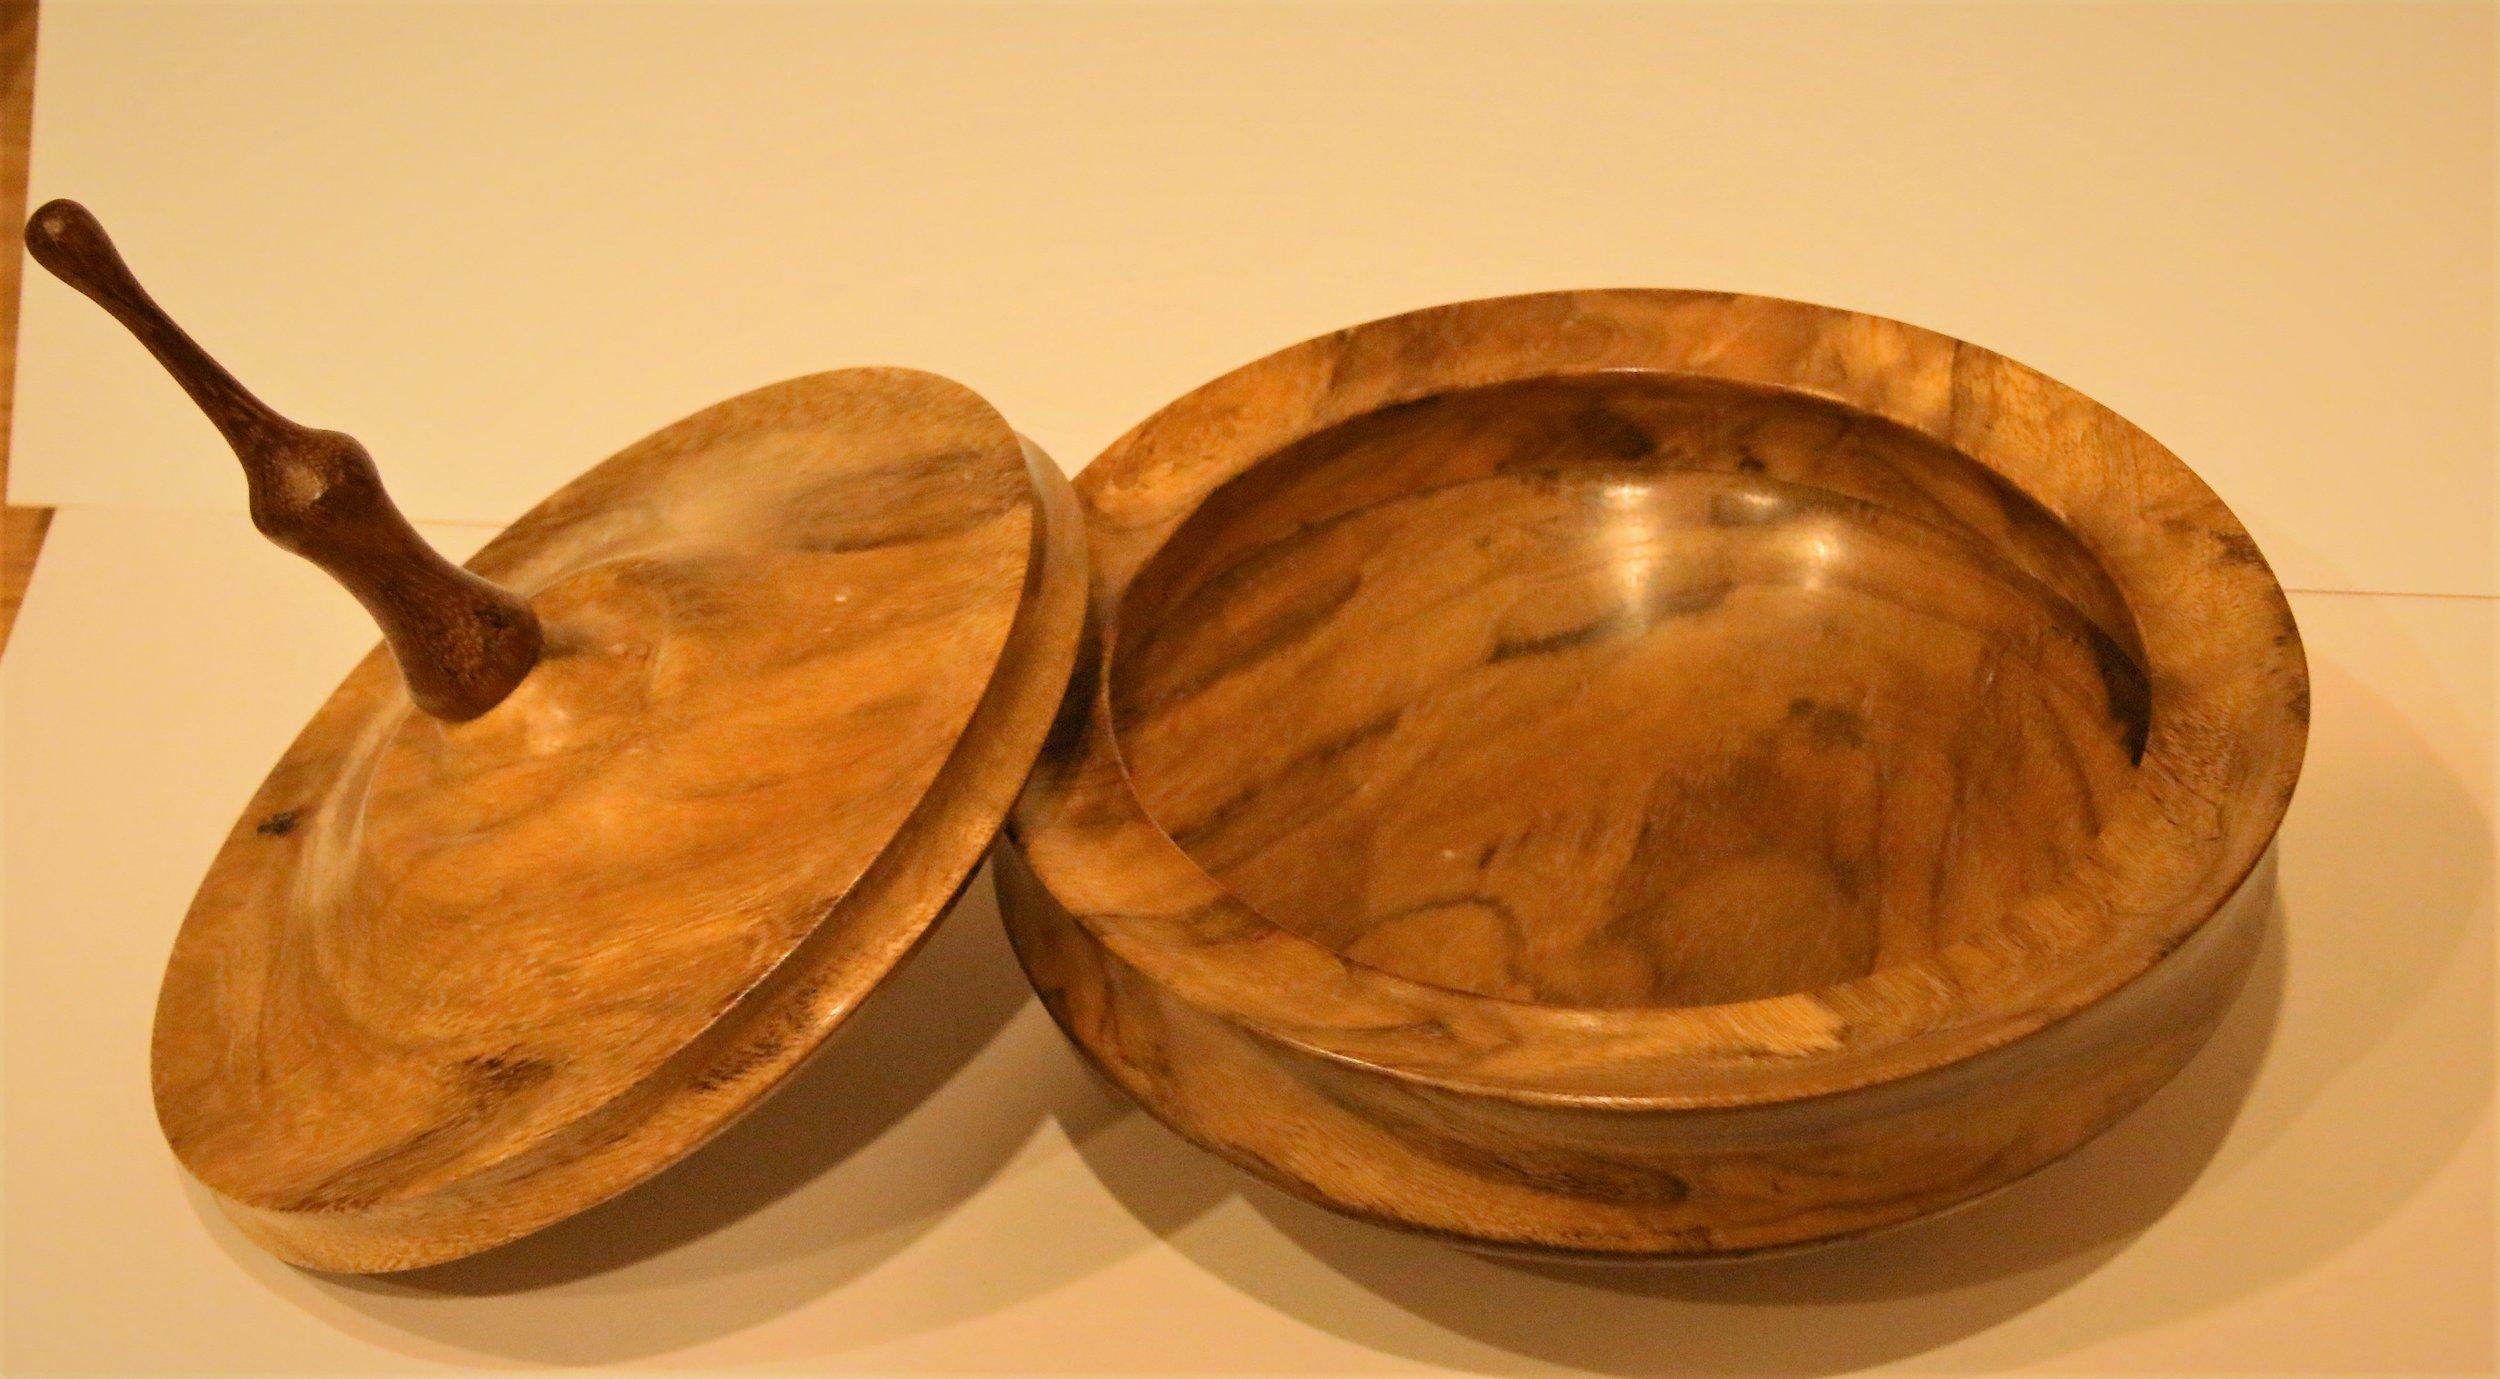 Lidded Bowl - Marri and Jarrah